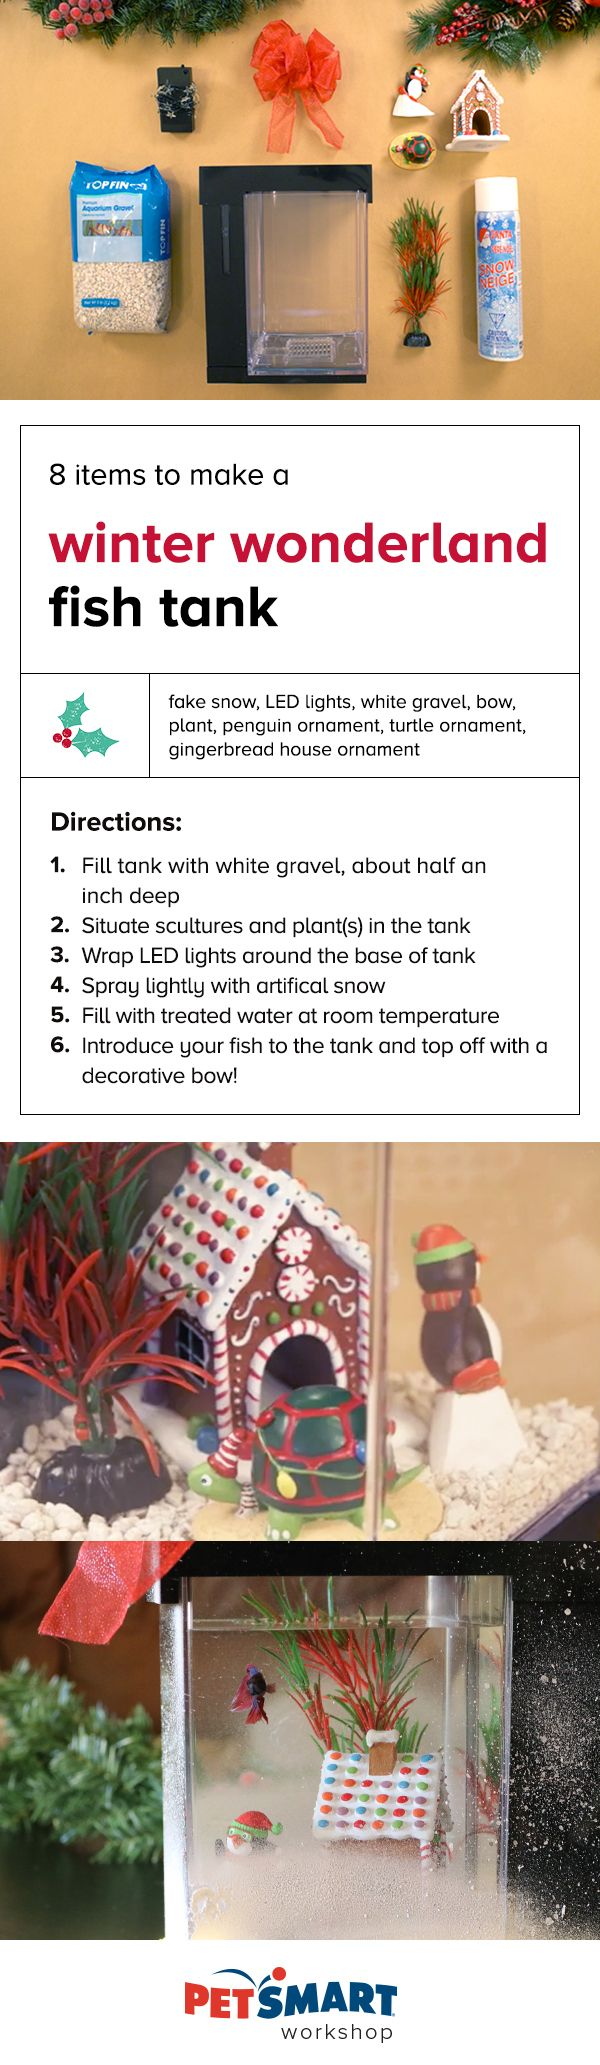 Juwel aqua clean aquarium fish tank gravel - Petsmart Workshop How To Turn Your Fish Tank Into A Winter Wonderland